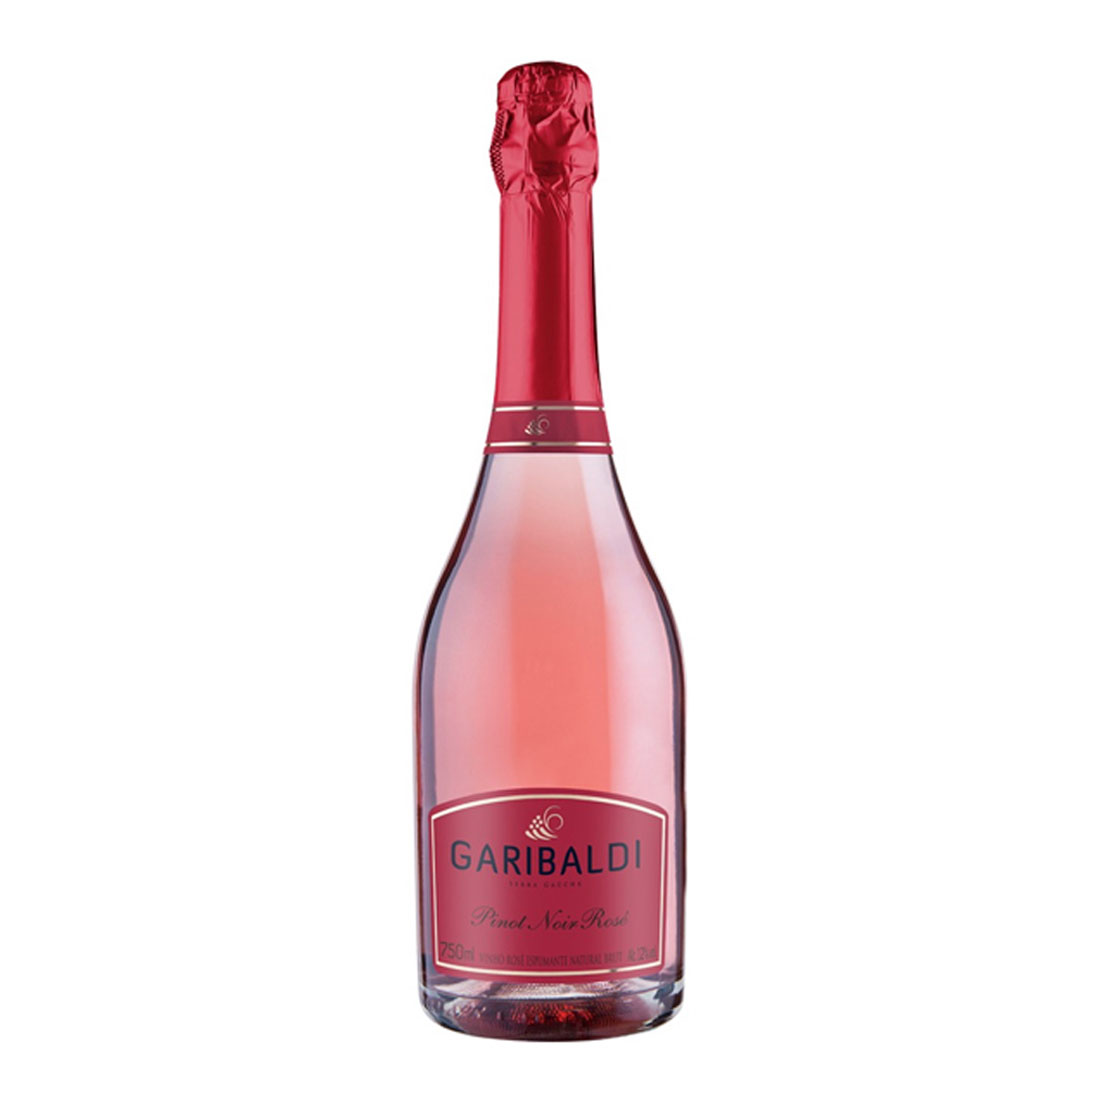 Espumante Garibaldi Brut Rosé Pinot Noir 750 ml